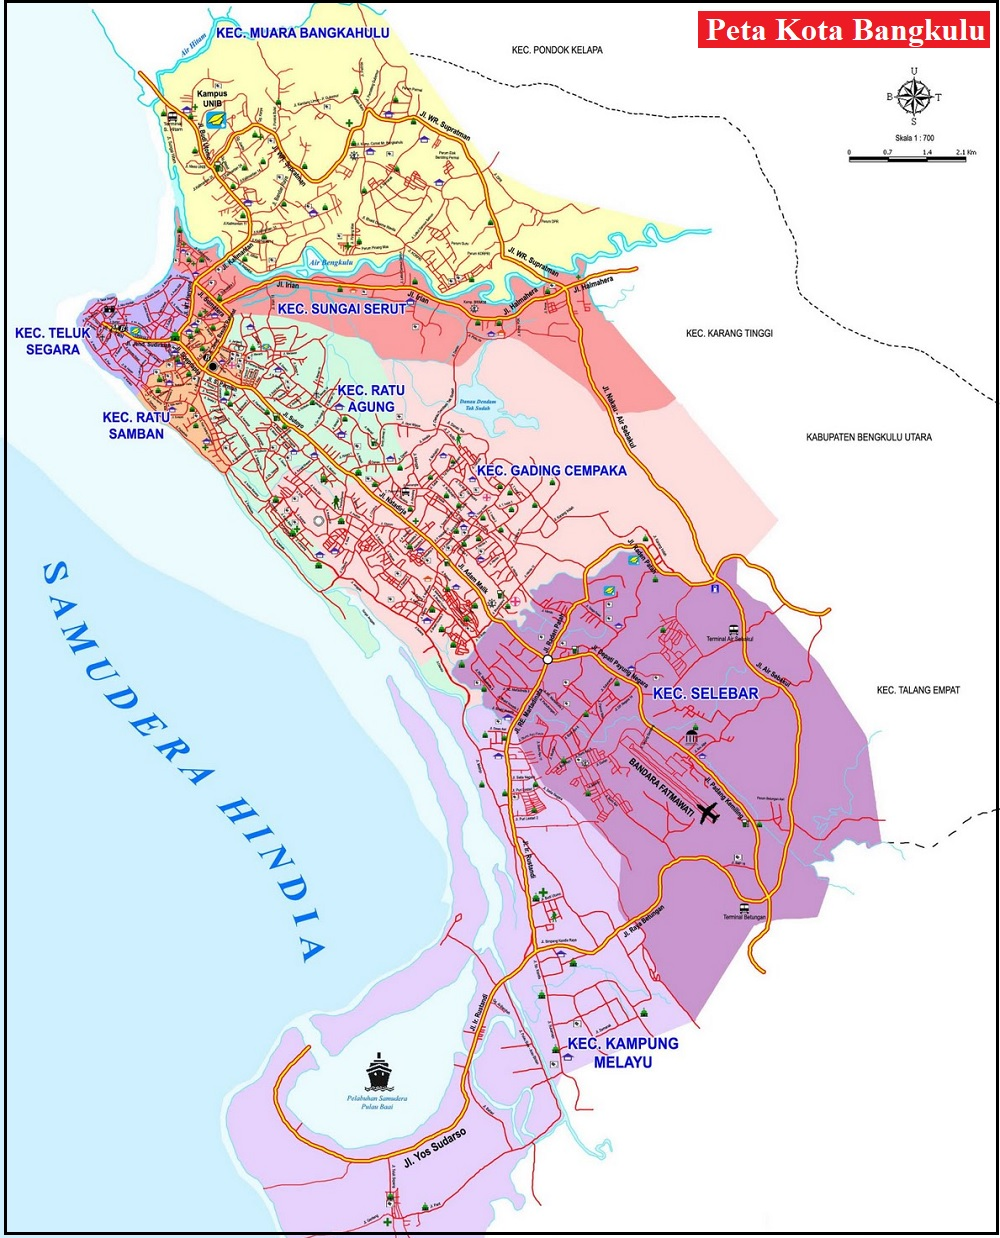 Peta Kota Bengkulu